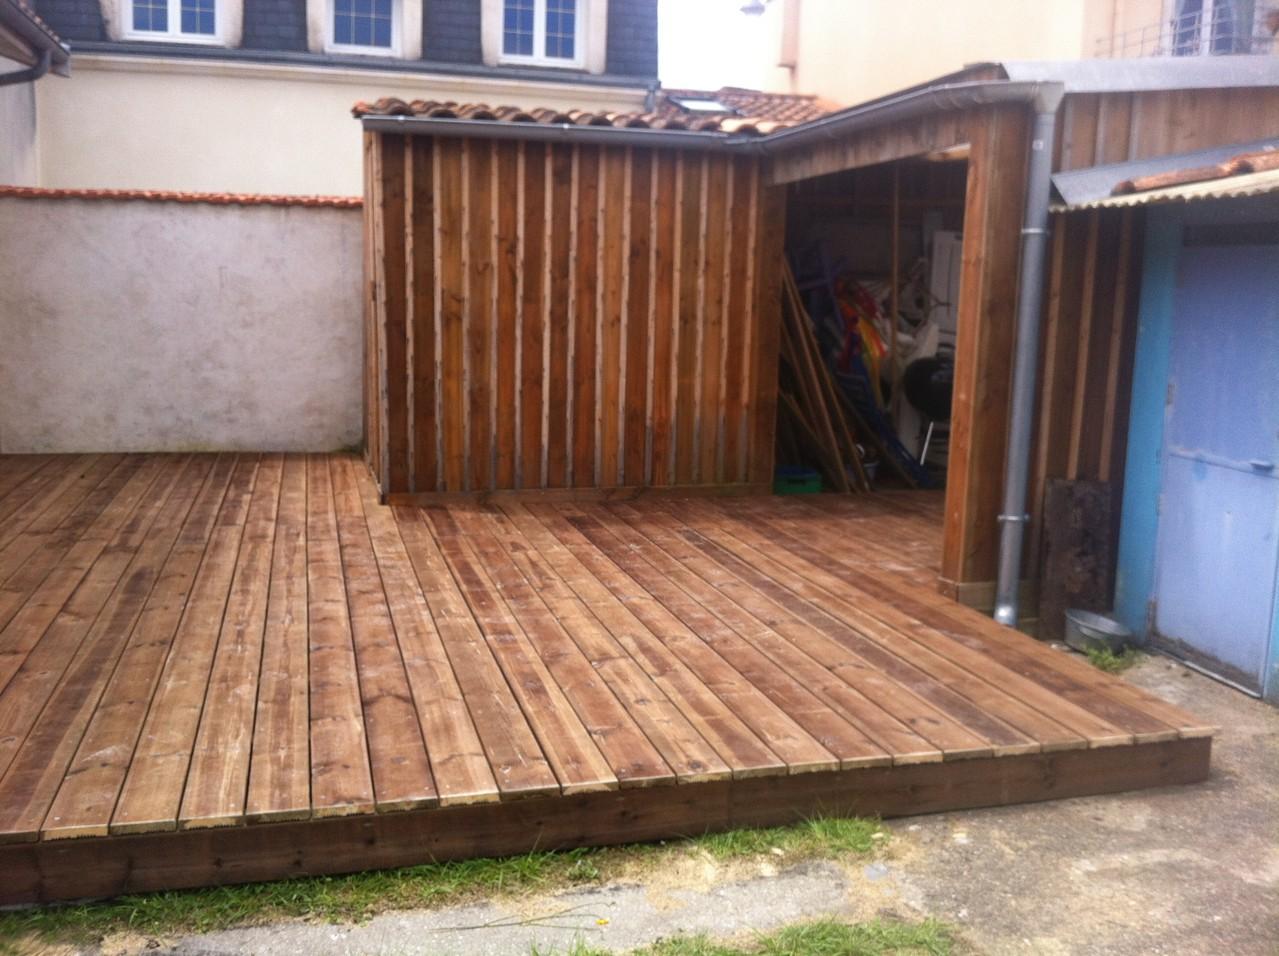 terrasse abri de jardin bois le bouscat happy home 33. Black Bedroom Furniture Sets. Home Design Ideas